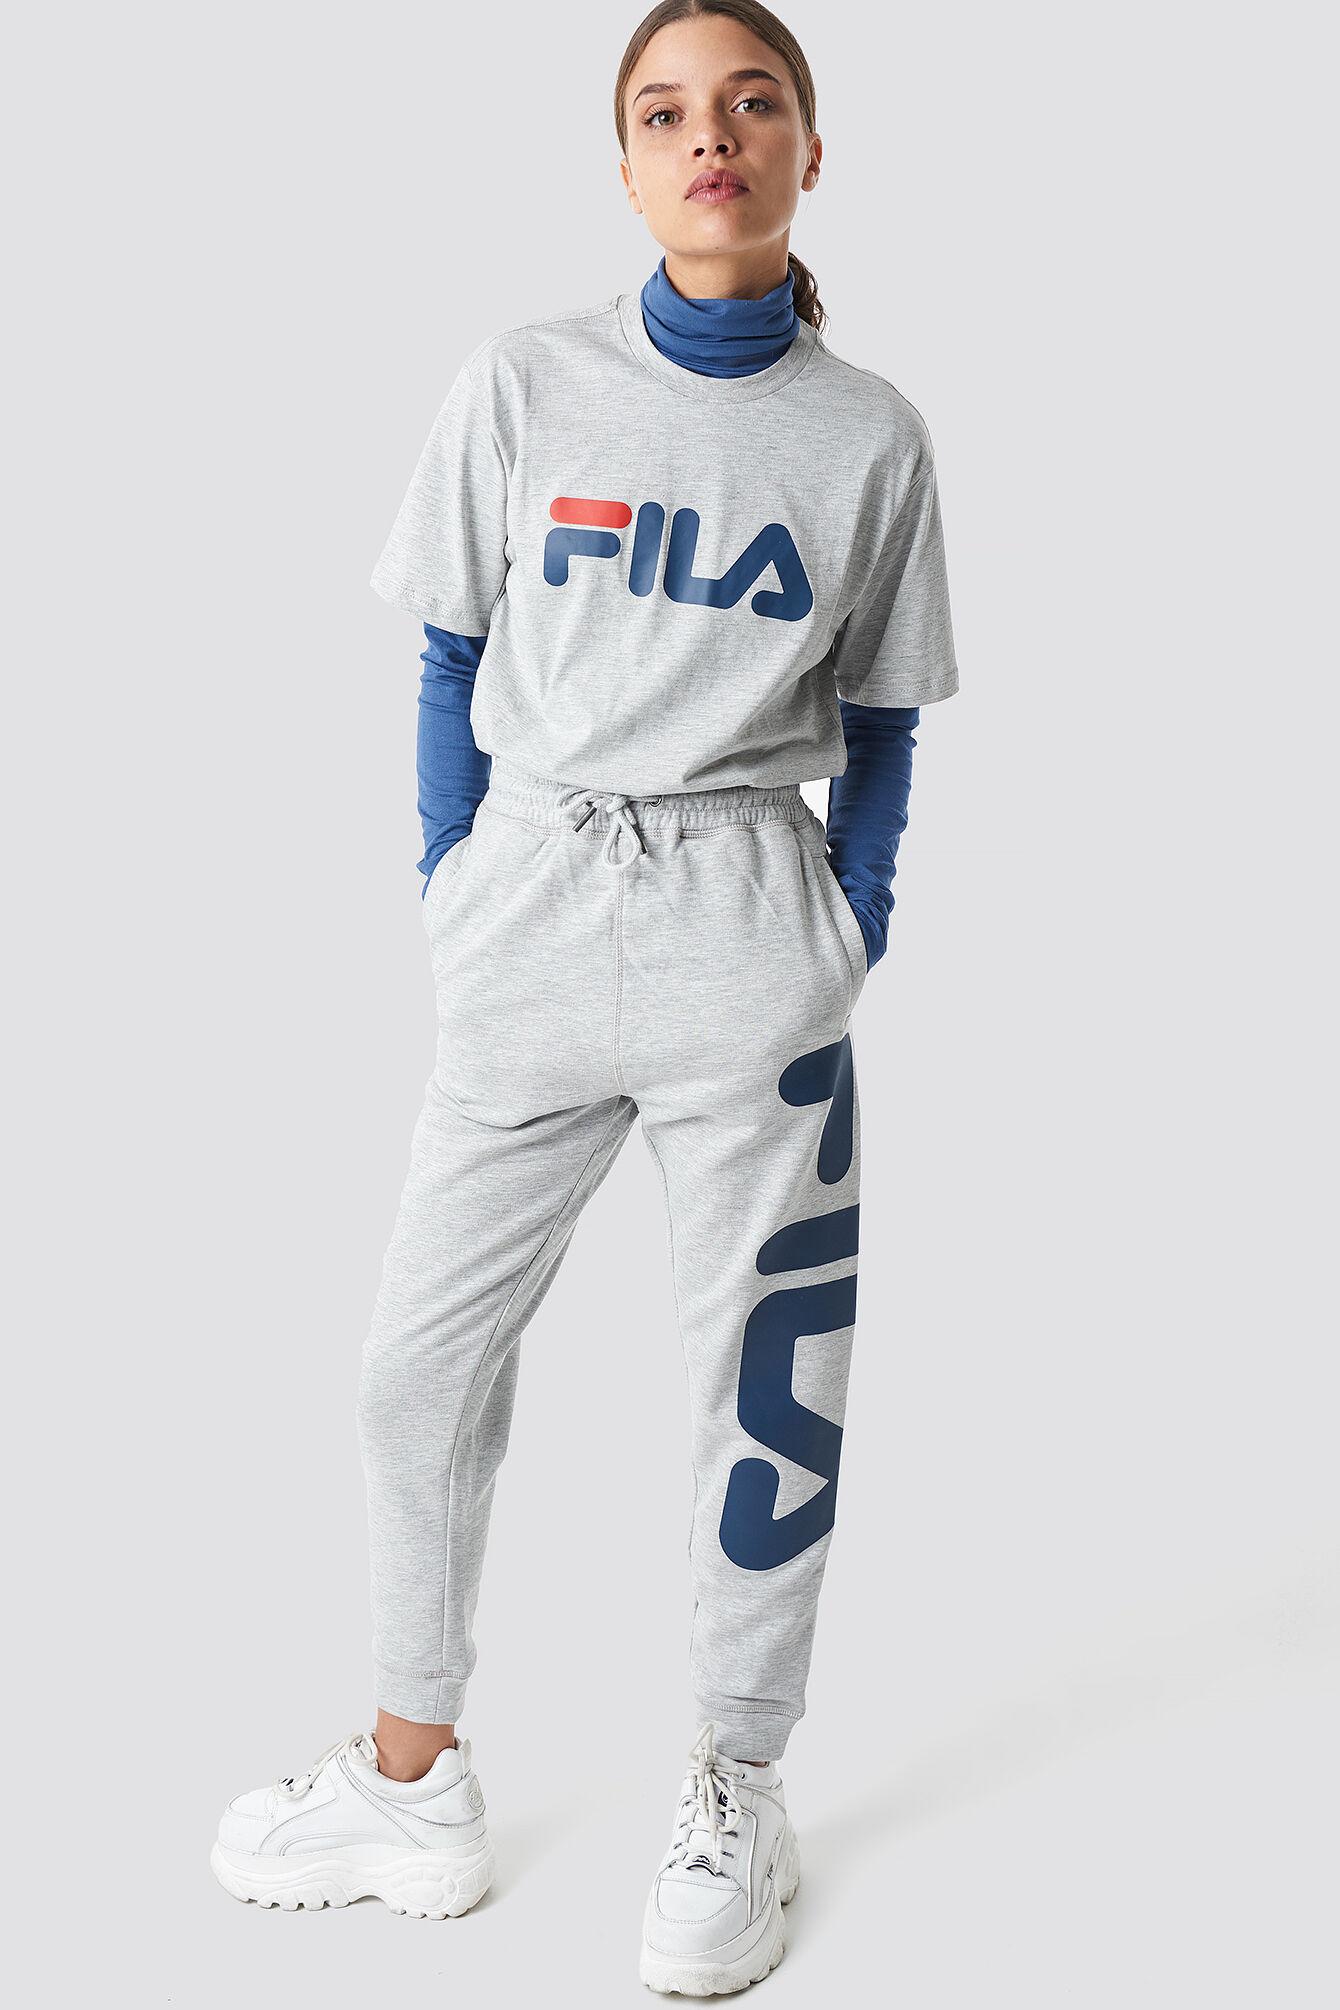 FILA Classic Pure Pants - Grey  - Size: Small